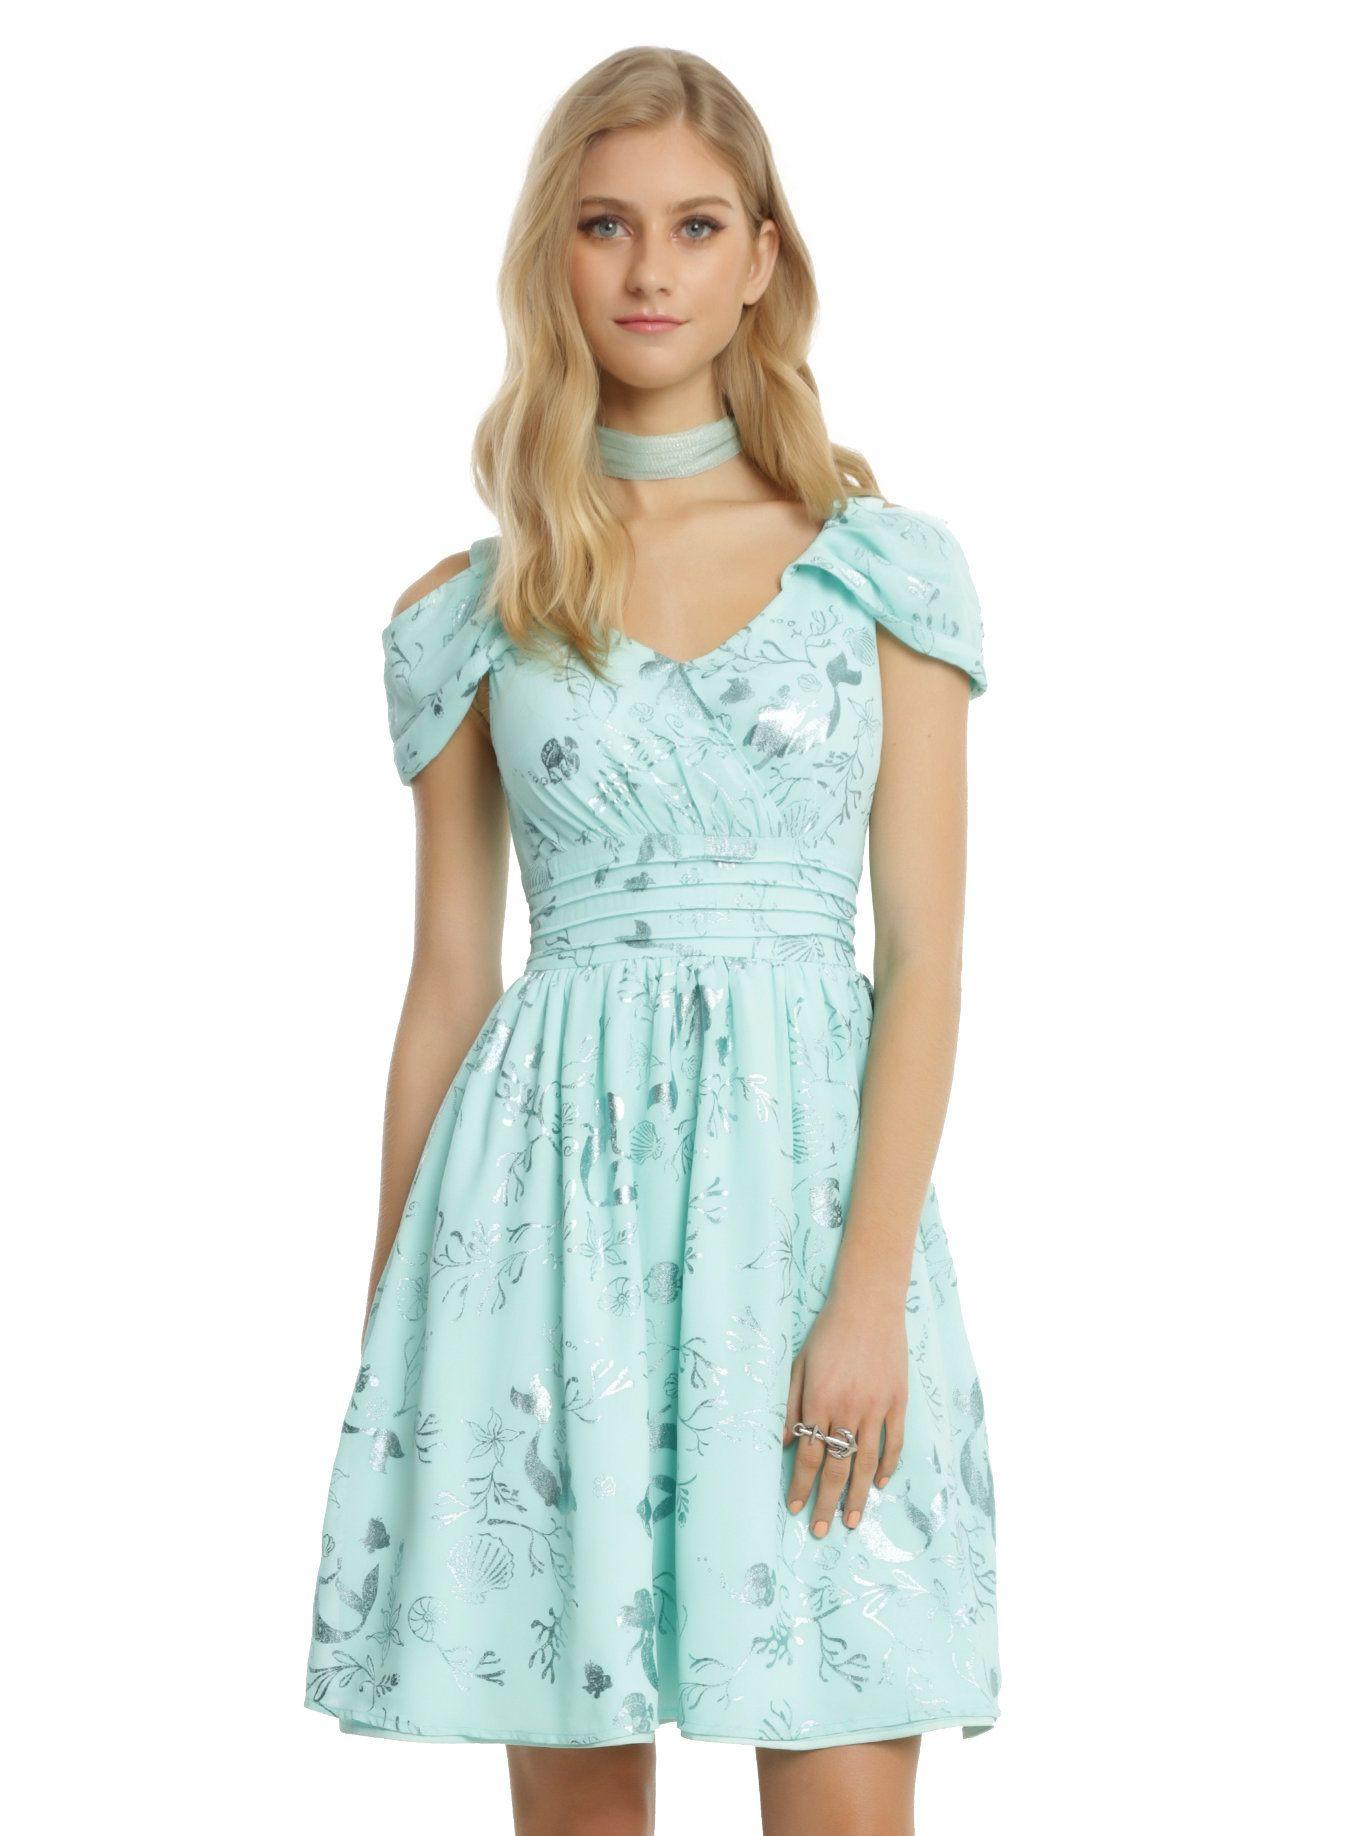 27f19aede06 Disney The Little Mermaid Ariel Green Foil Princess Dress